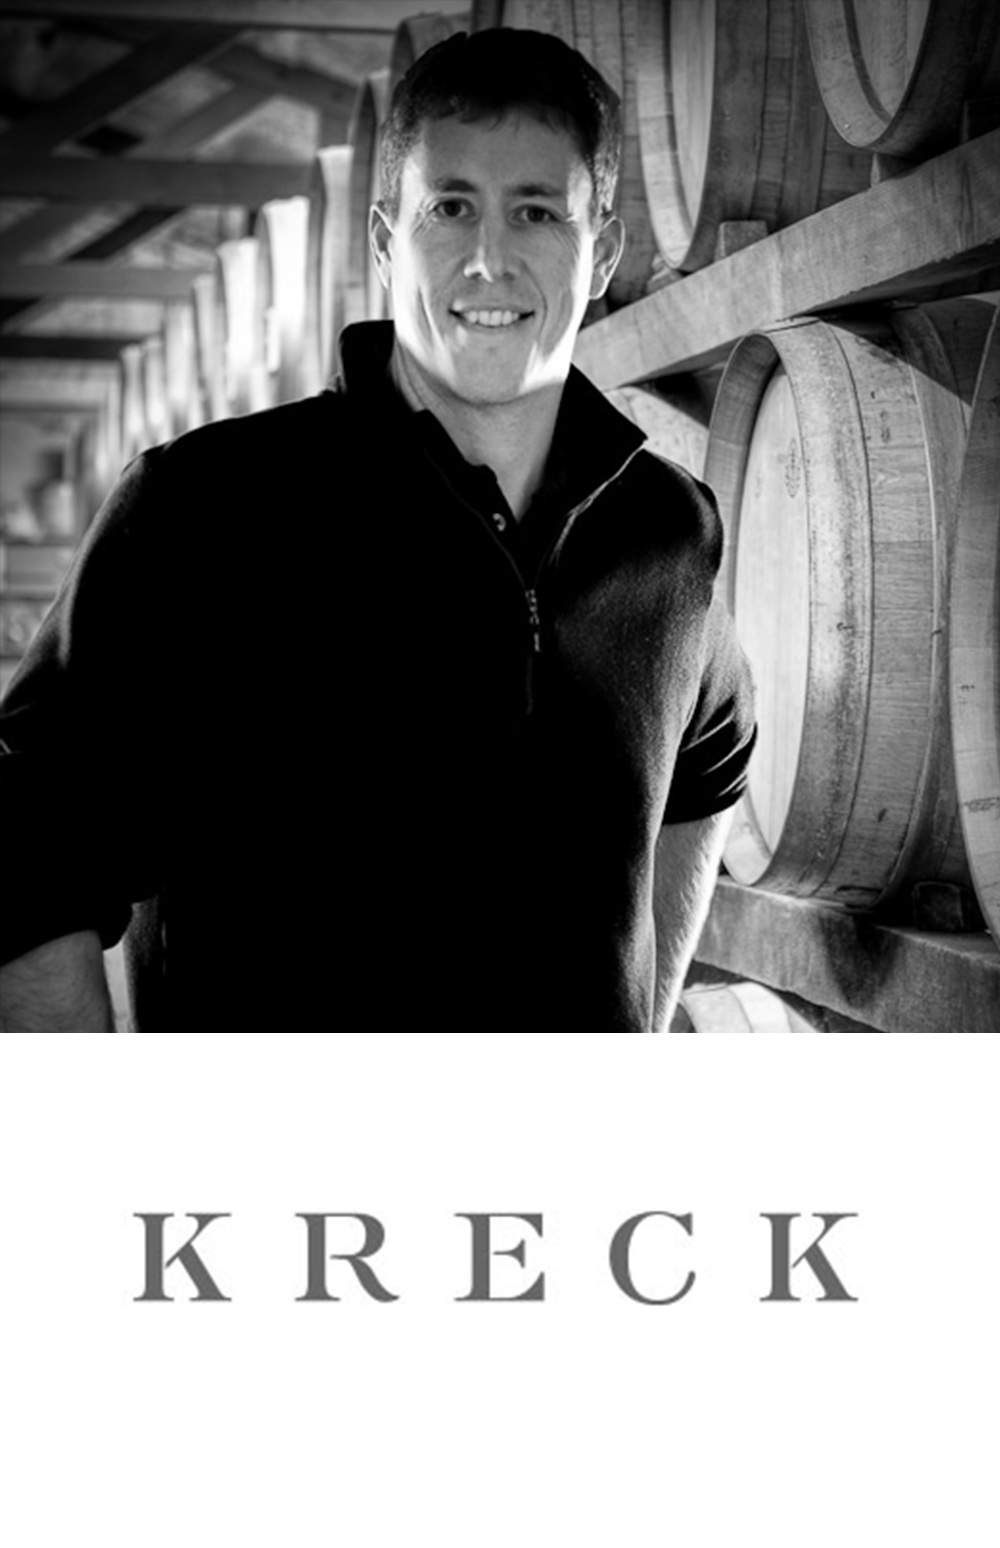 kreck-wines-black-white.jpg